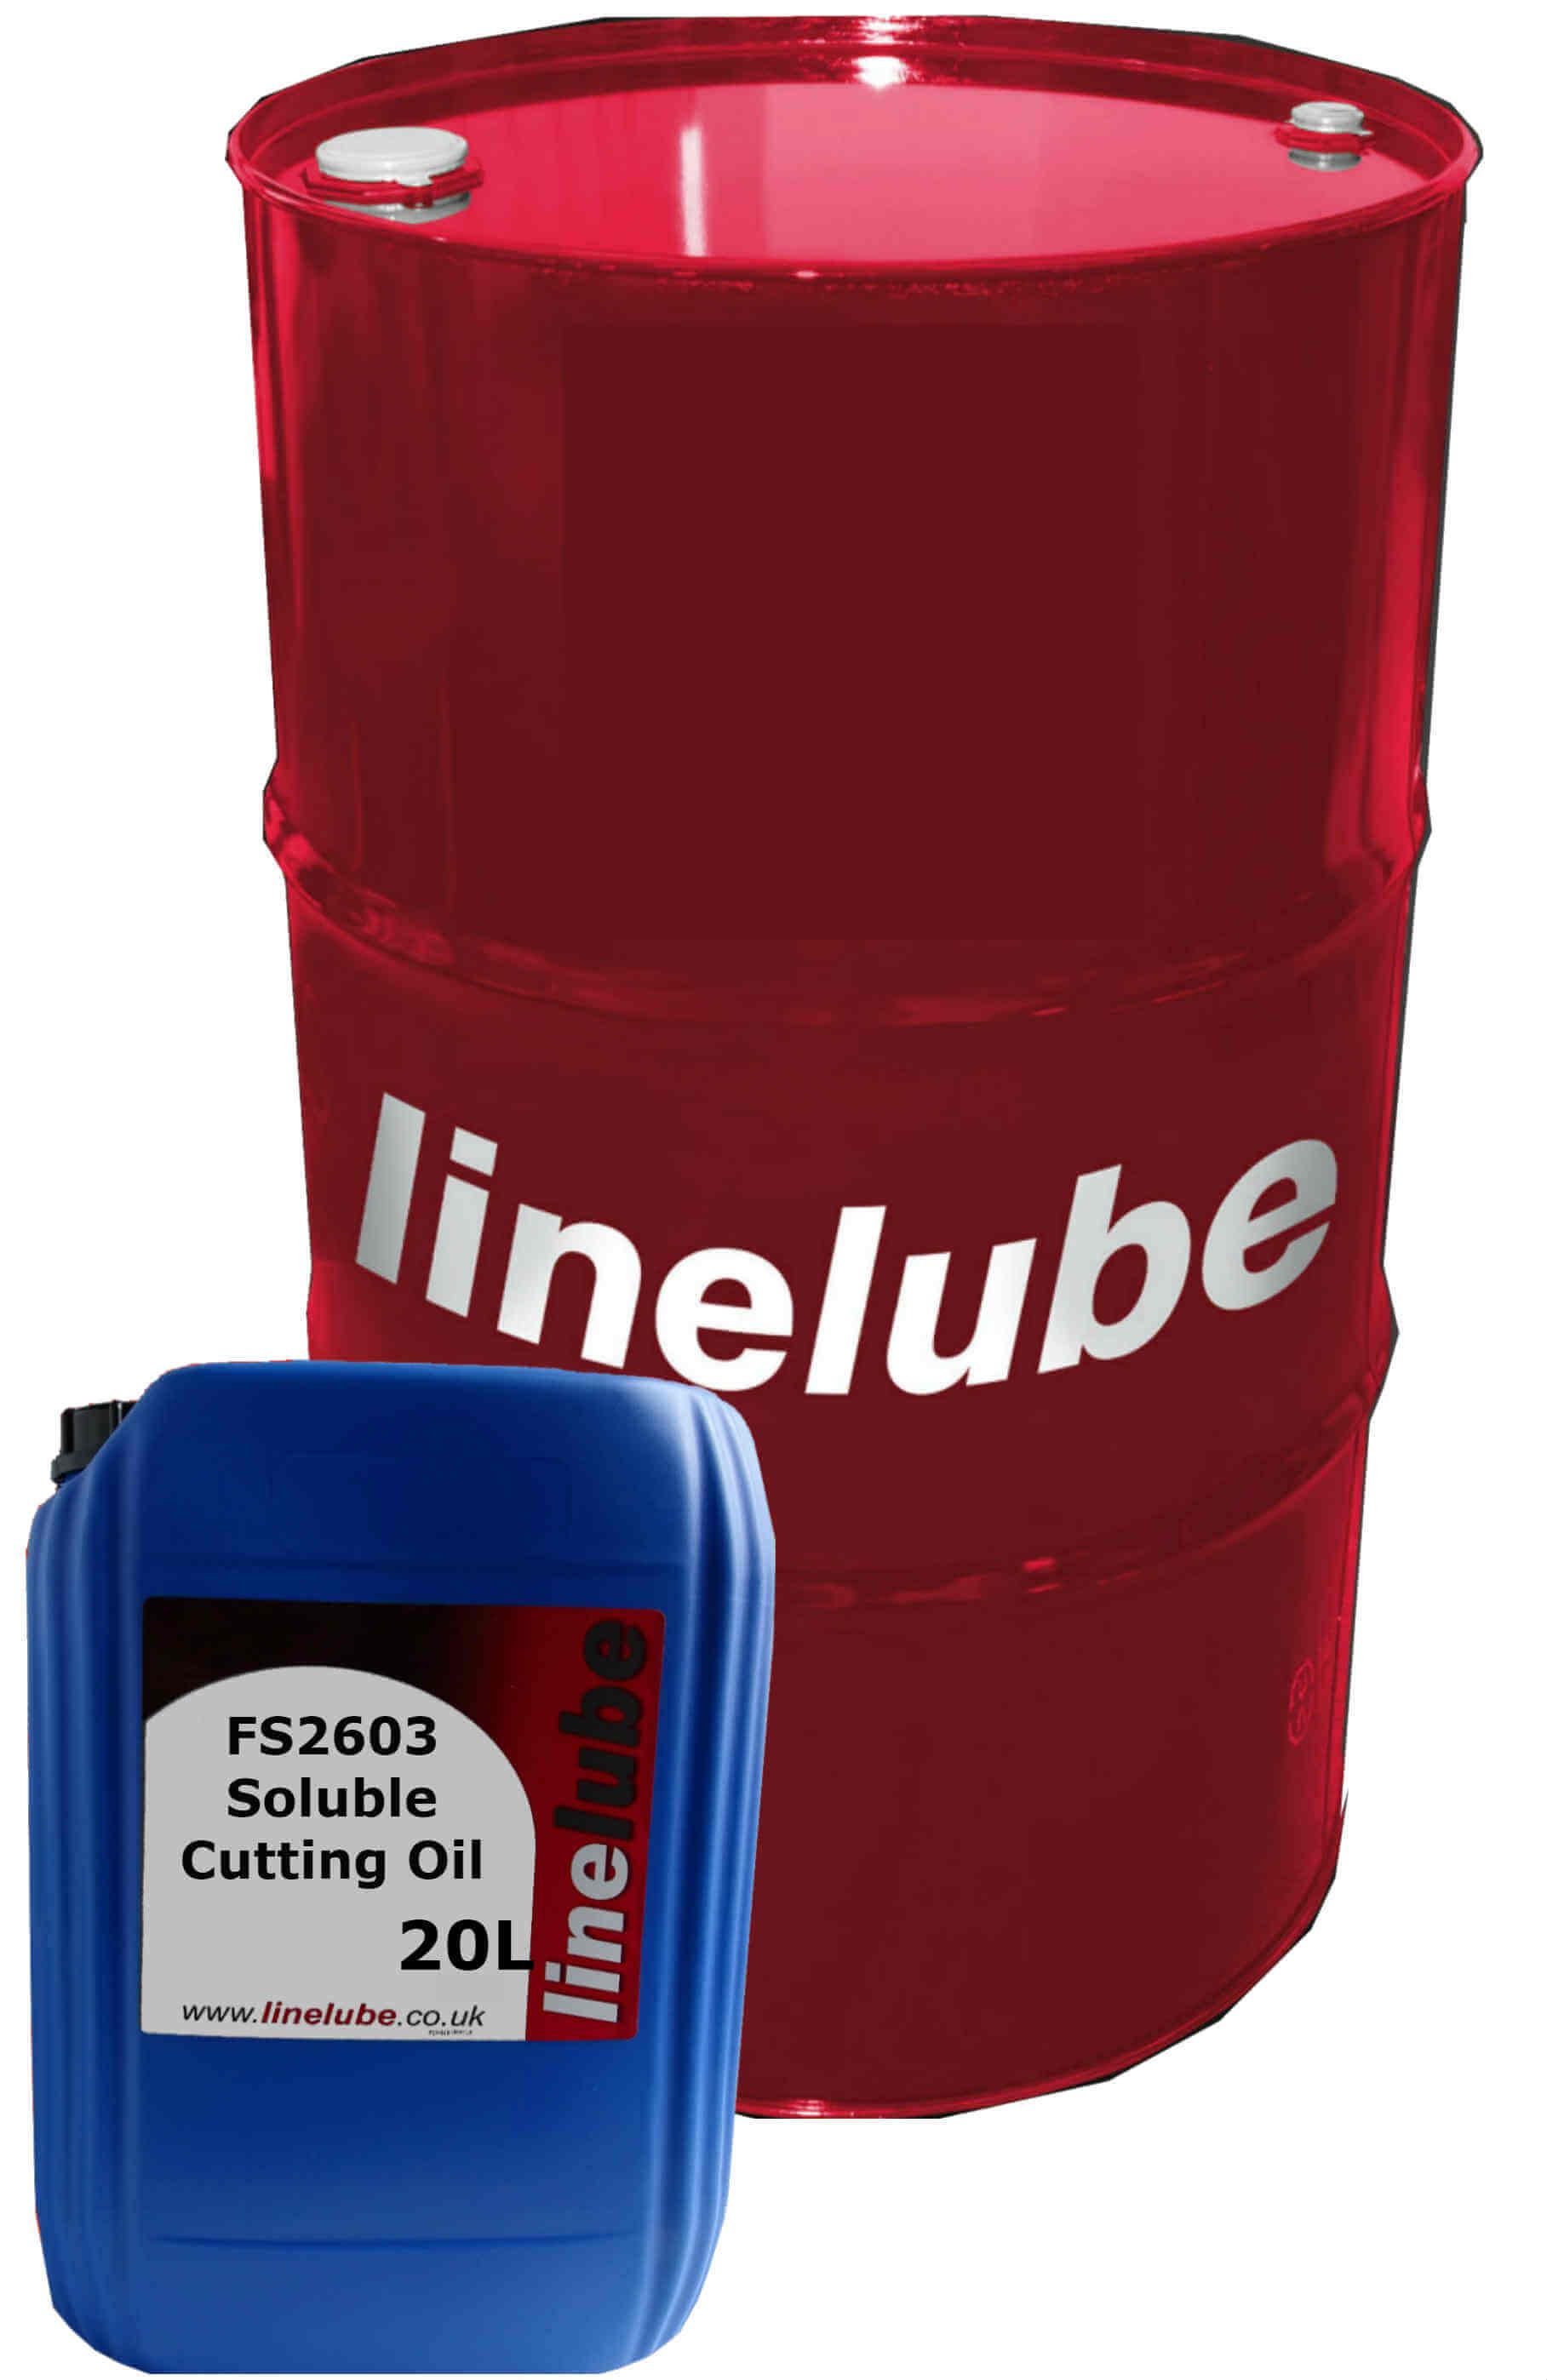 Linelube FS2603 Soluble Cutting Oil